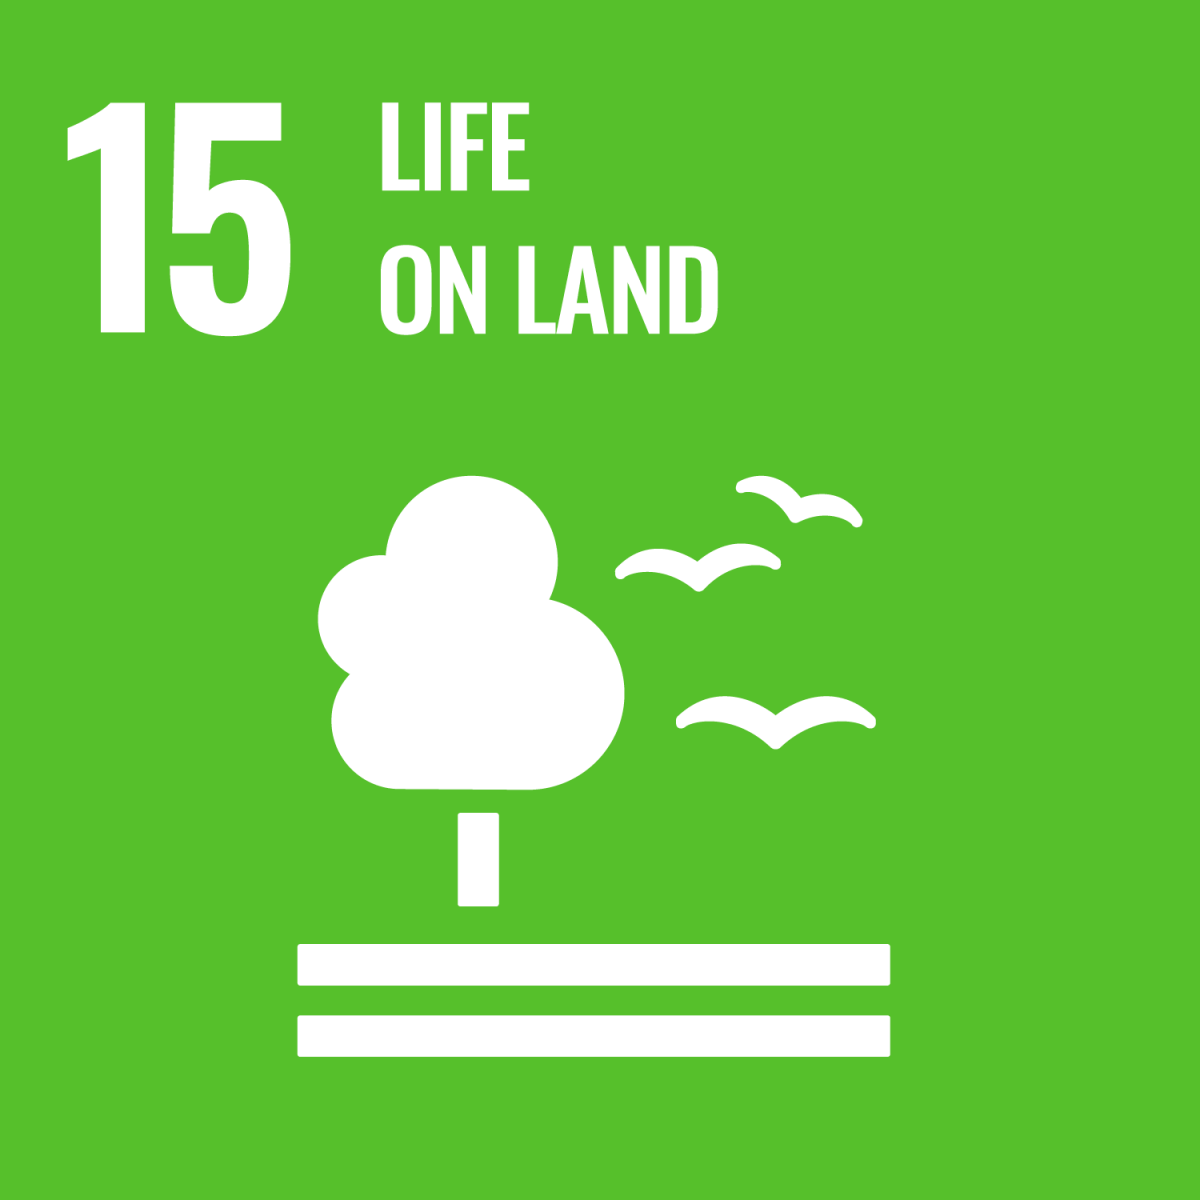 SDG 15 - Life on Land